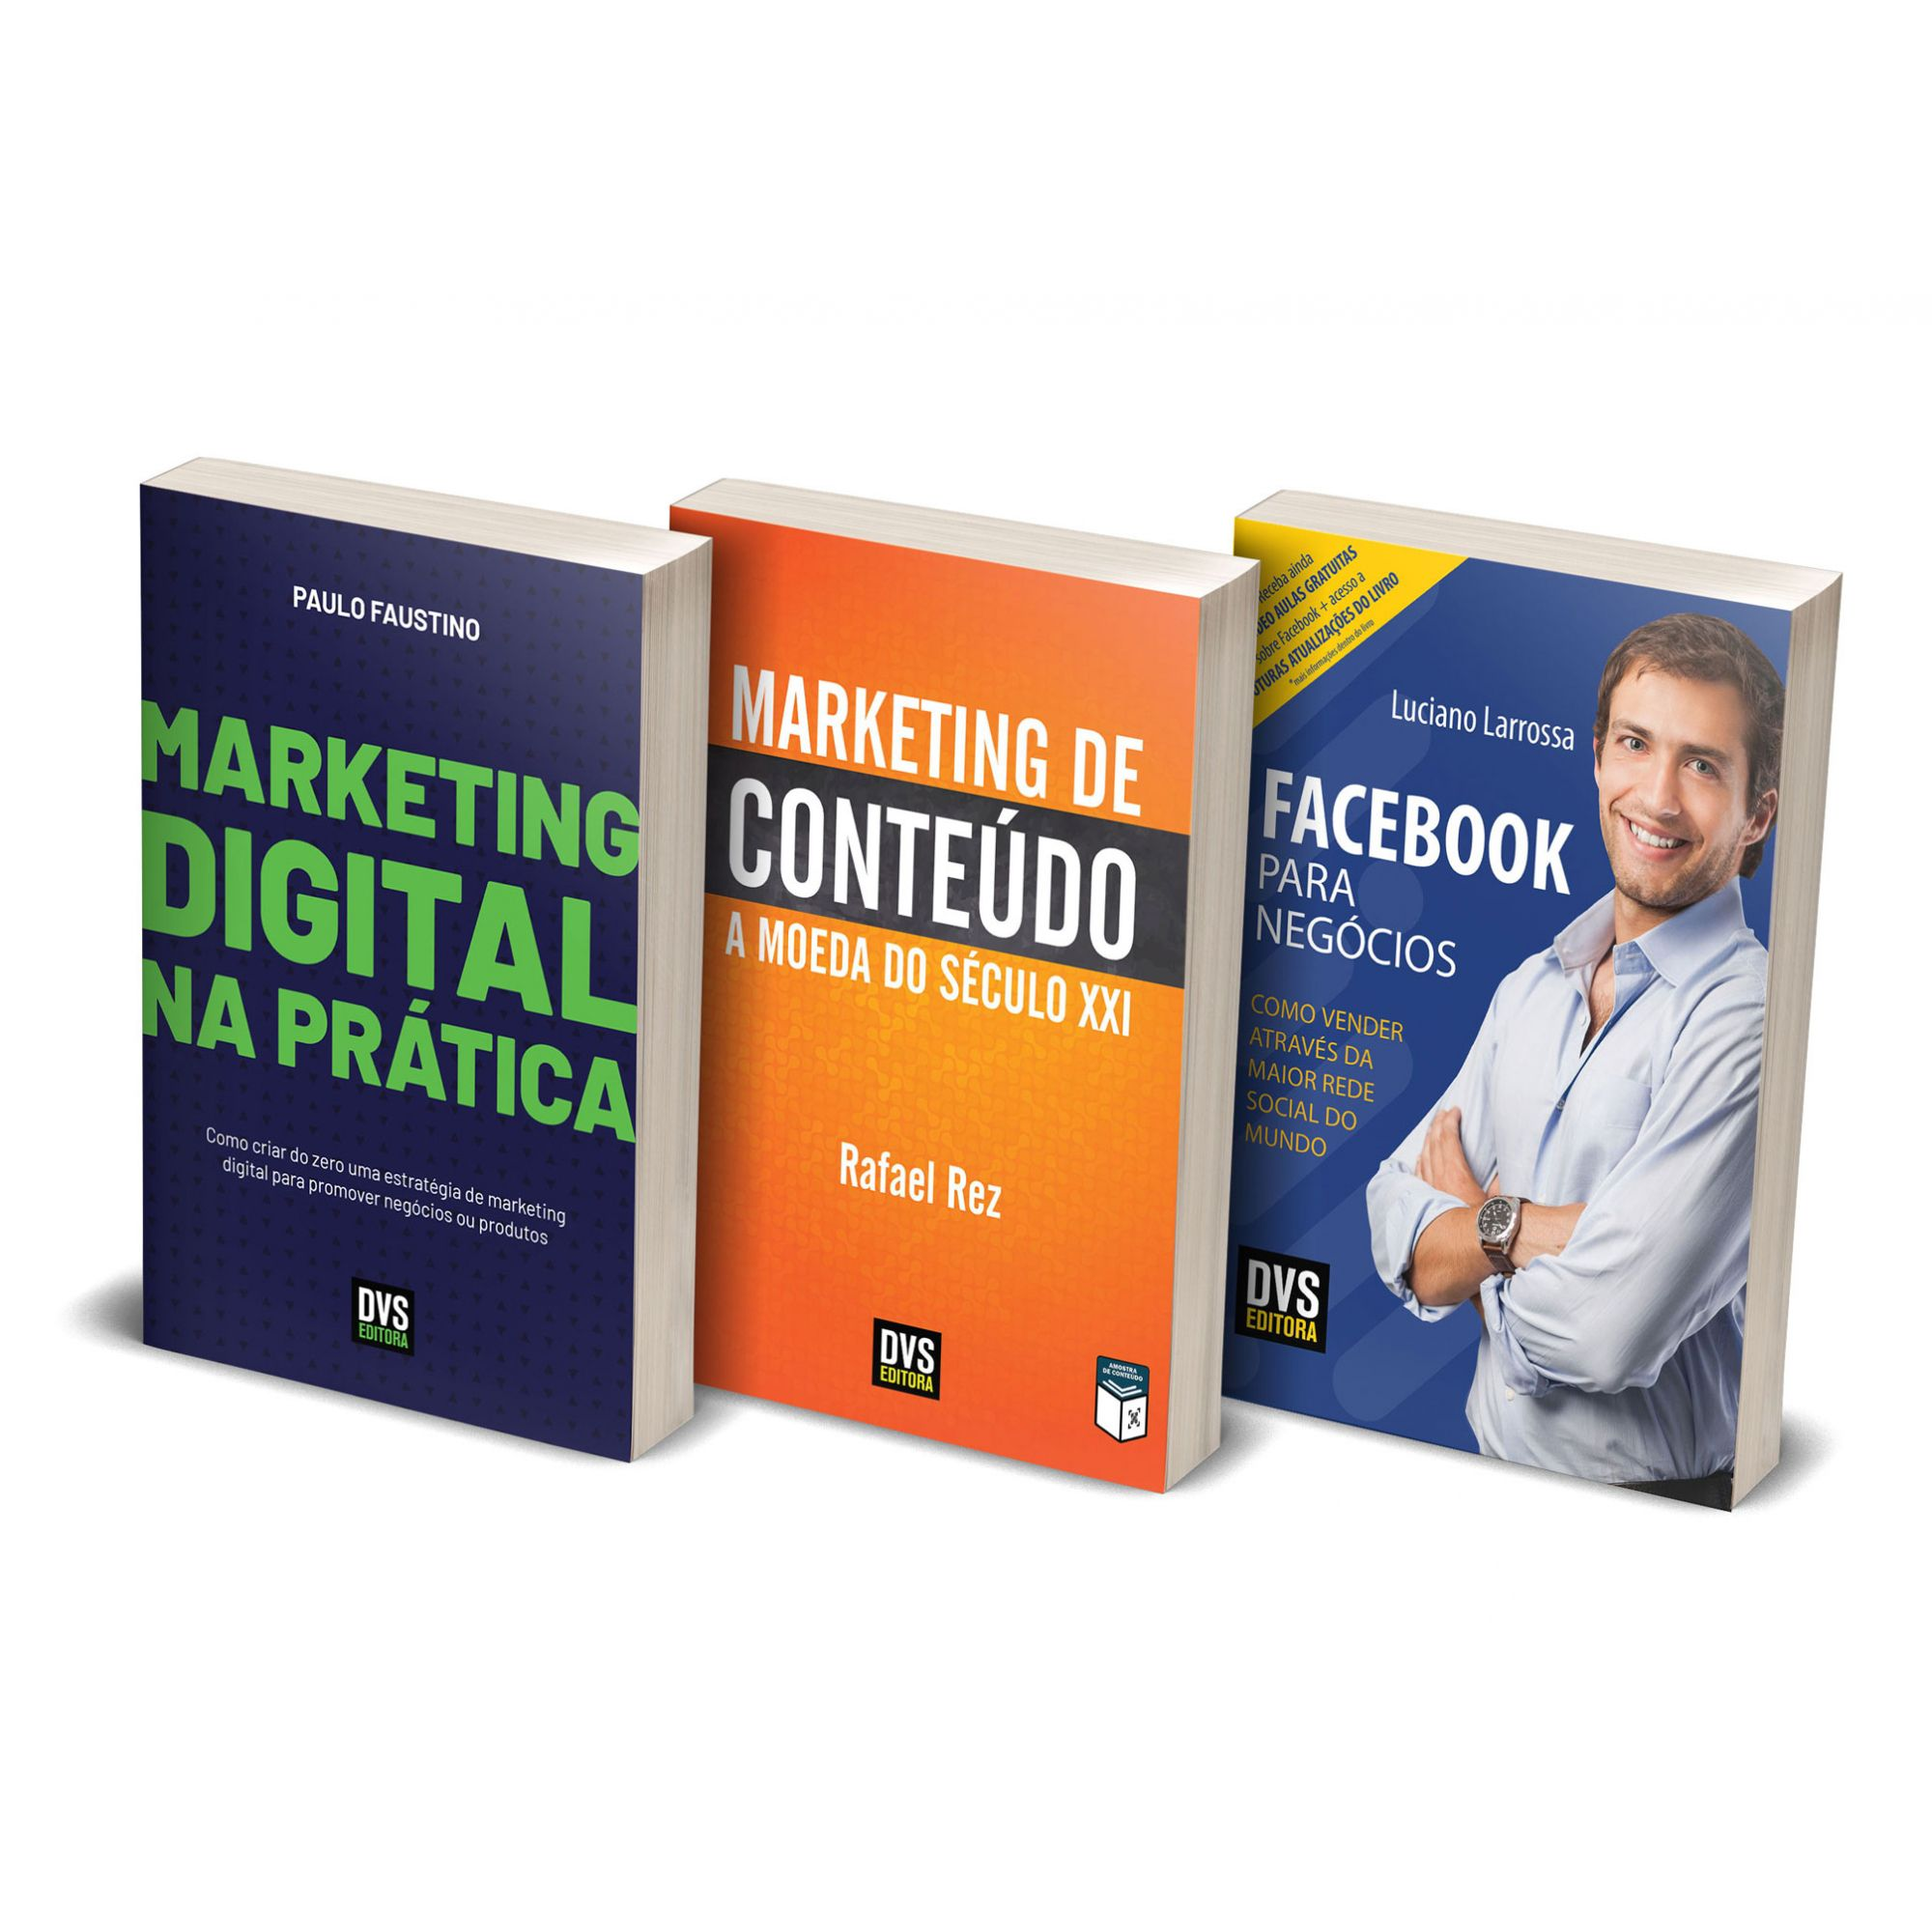 Kit Marketing Digital com 3 livros - Black Friday